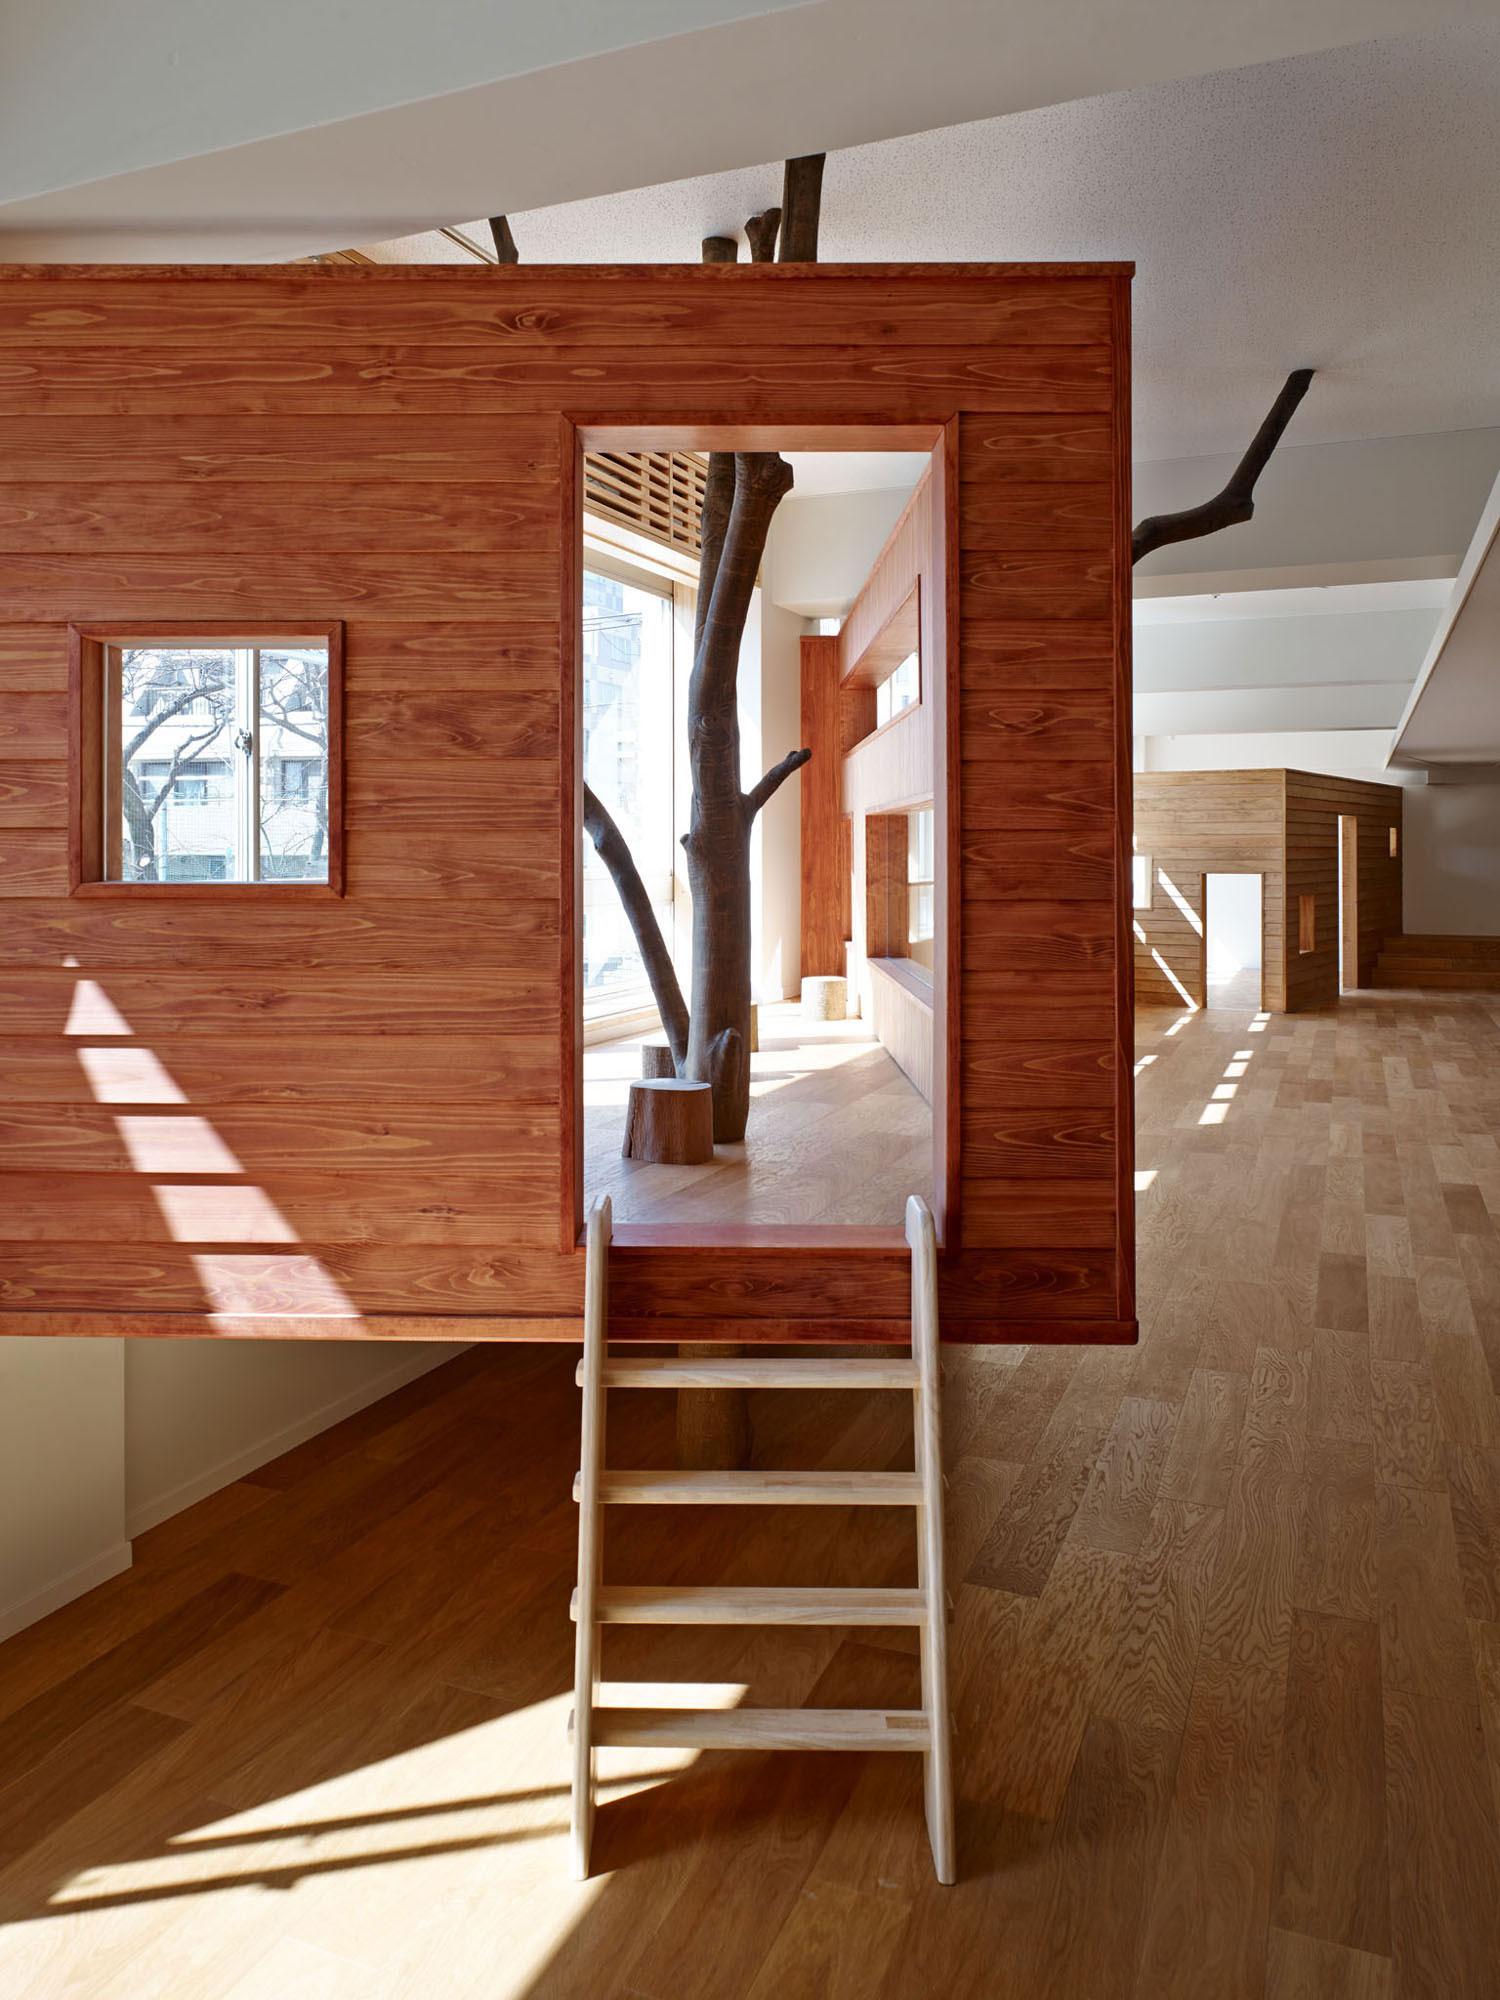 Mokumoku Kindergarten in Tokyo, Japan by 16A Inc Architects   Yellowtrace.